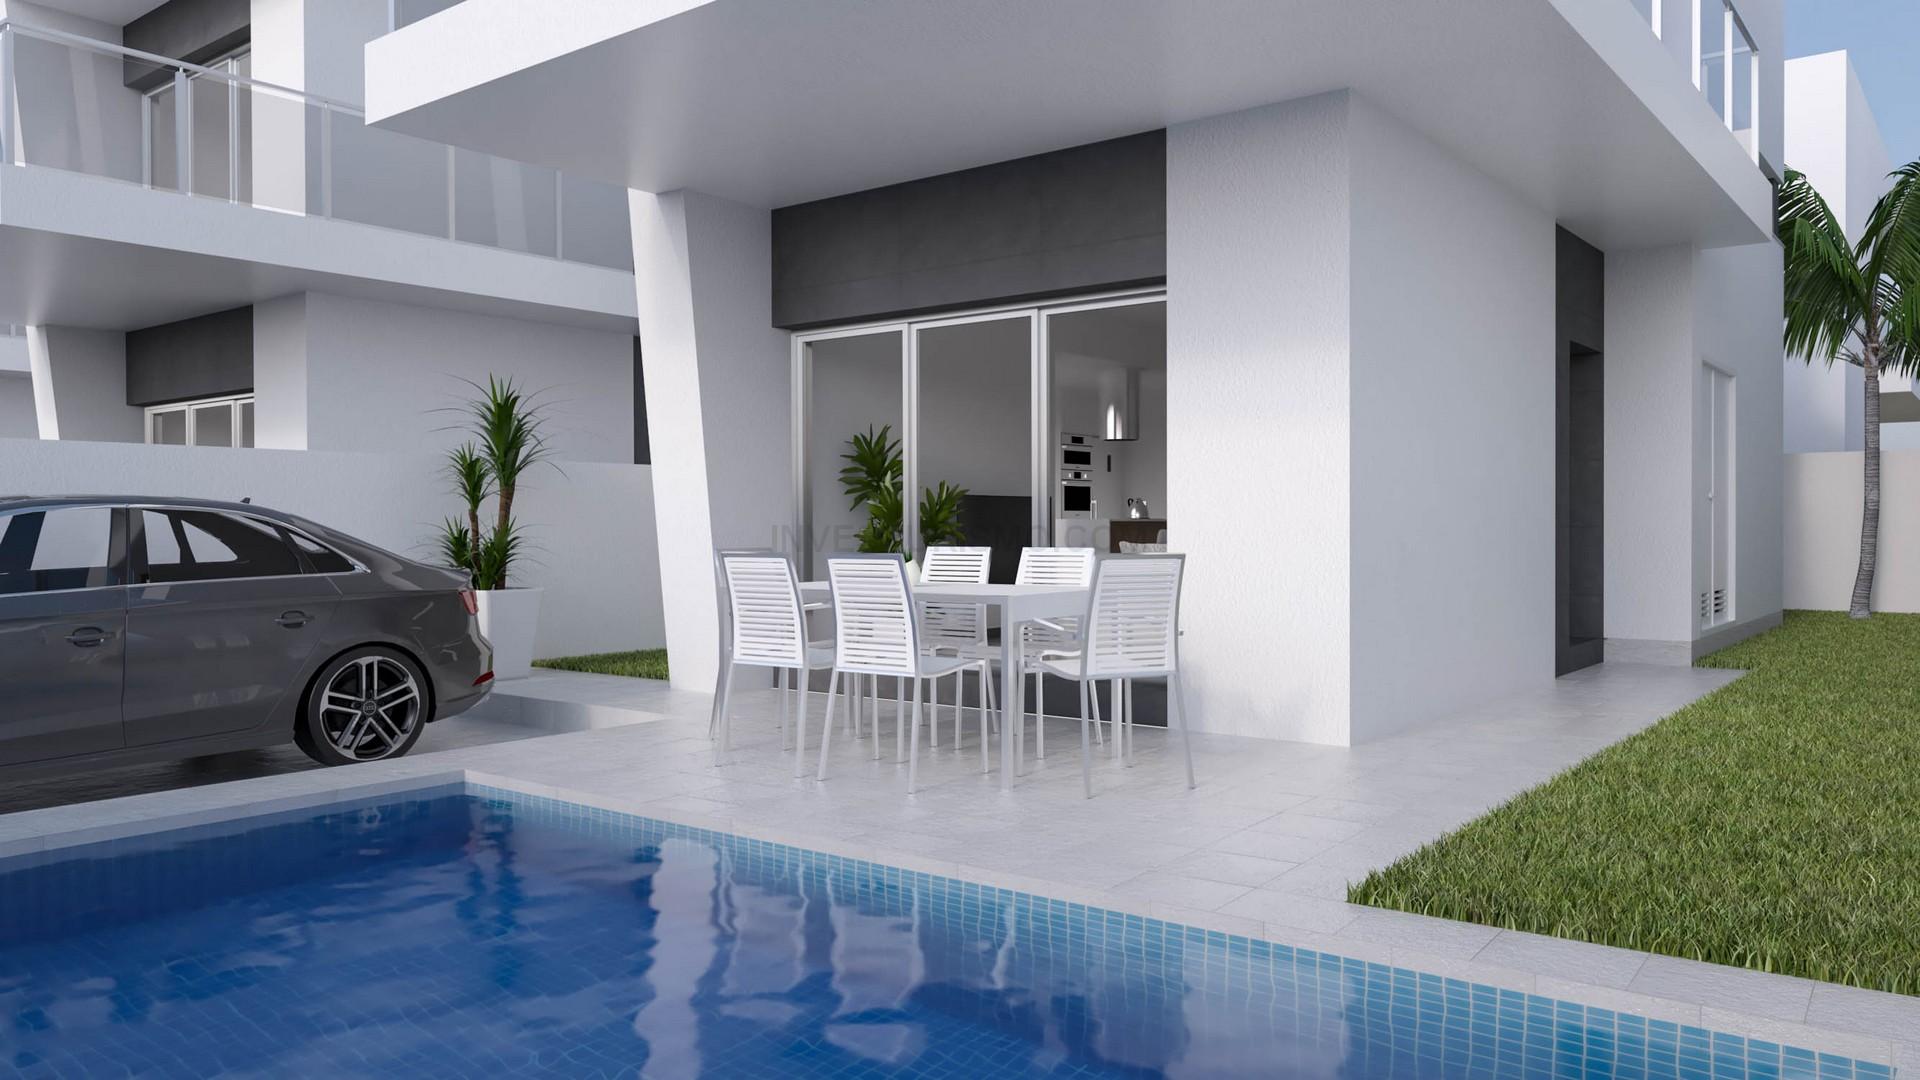 New build semi-detached villas 3 bedrooms in Daya Vieja